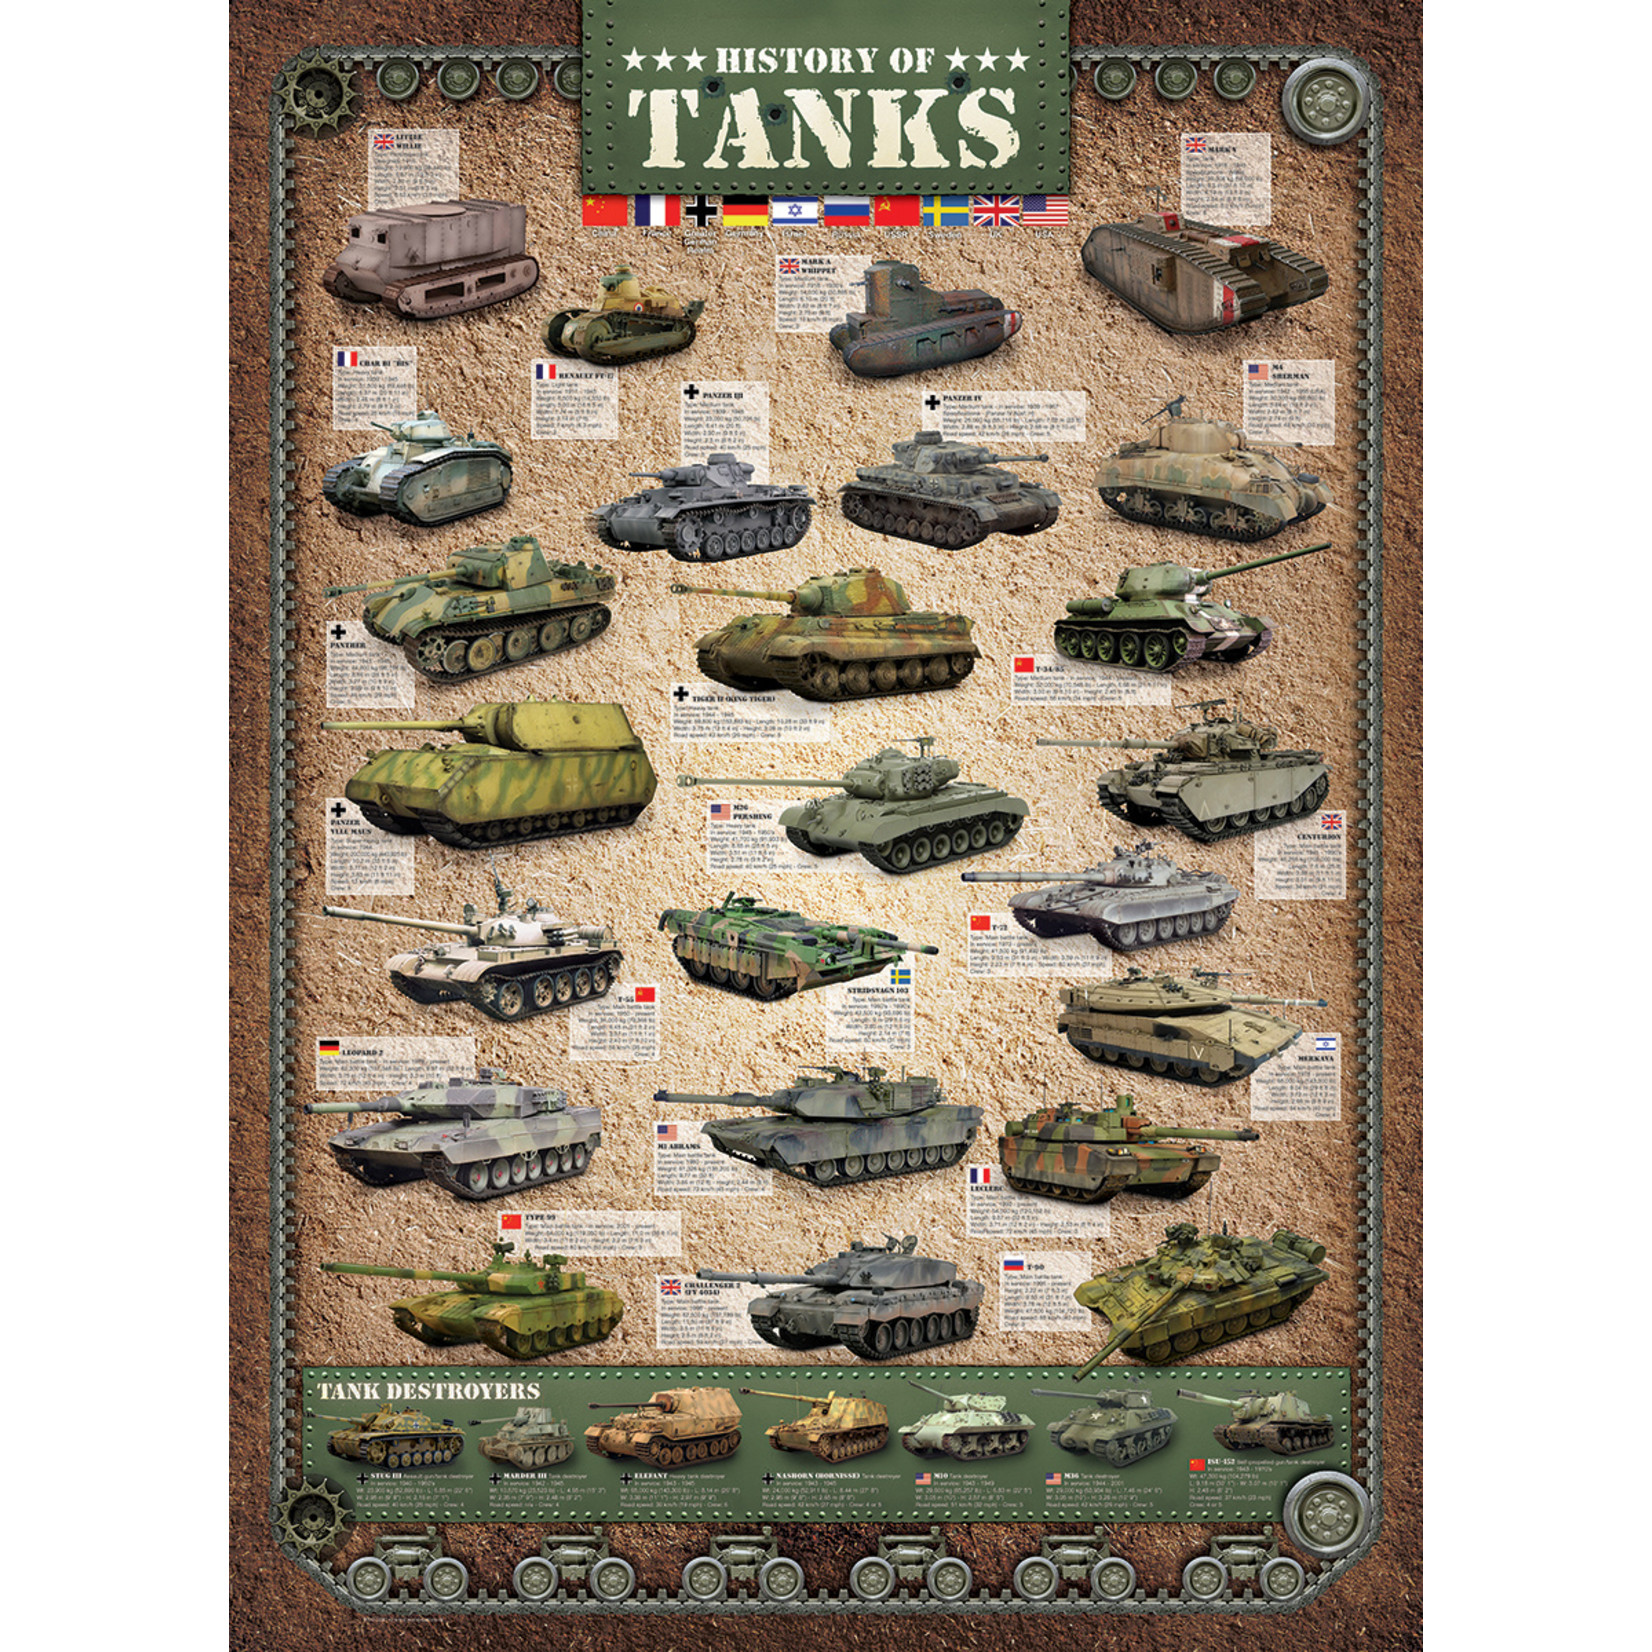 EuroGraphics Puzzles History of Tanks 1000pc